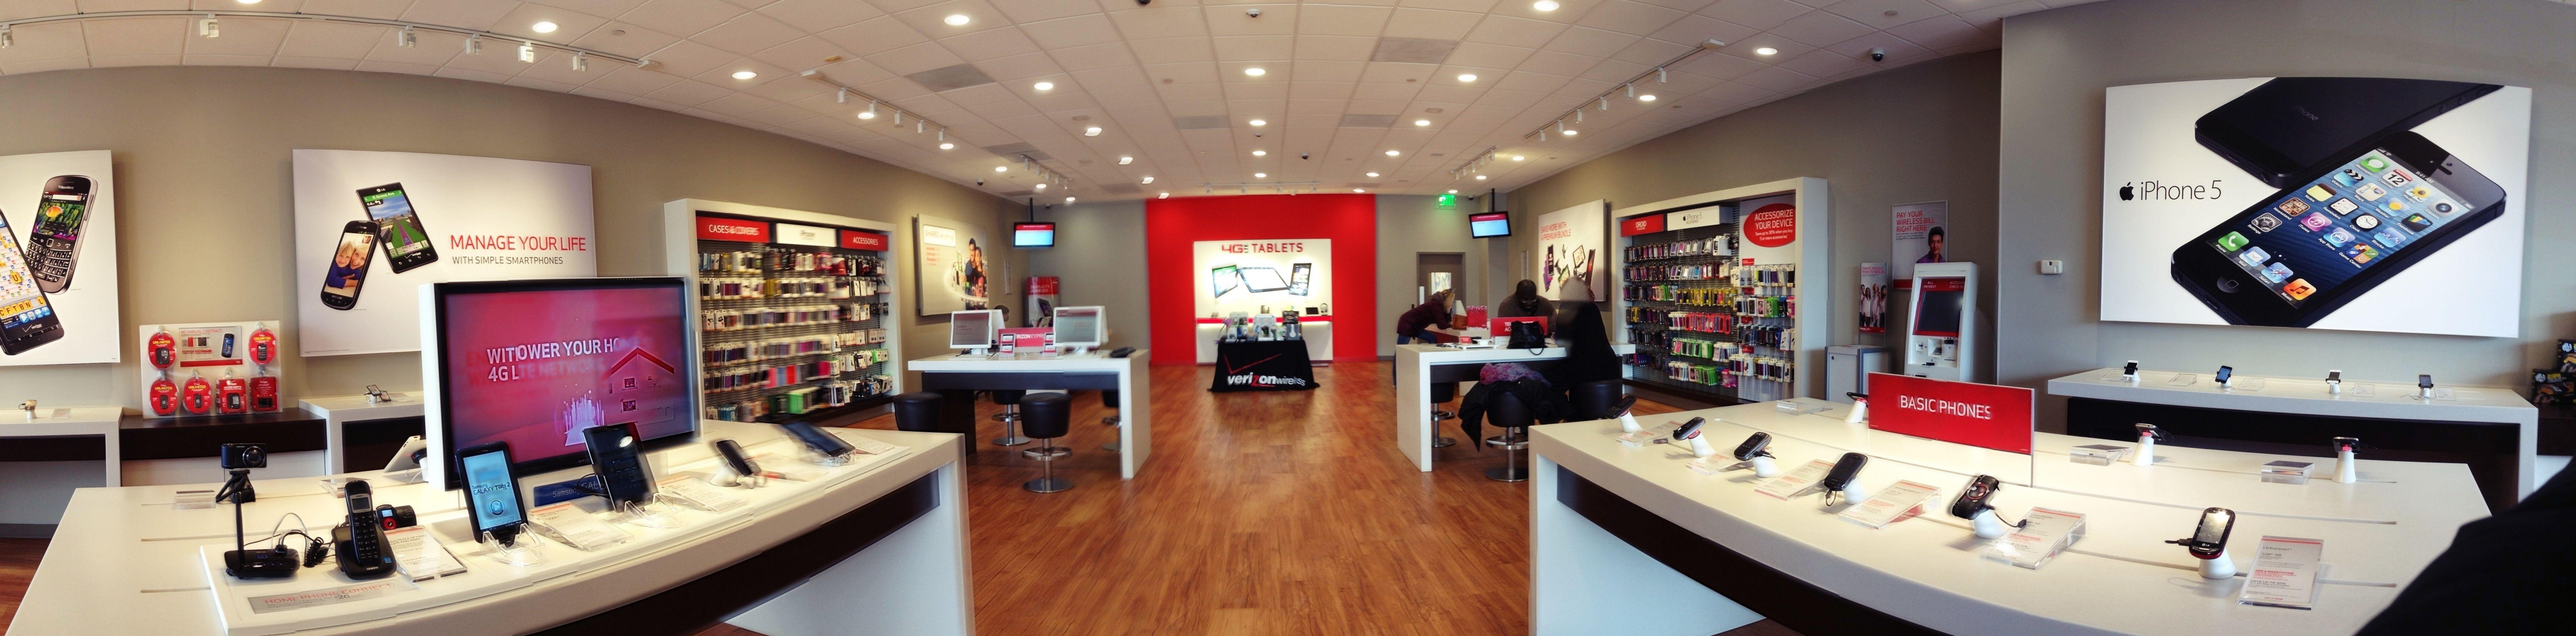 Verizon (NYSE VZ) Ditches Phone Subsidies, Service